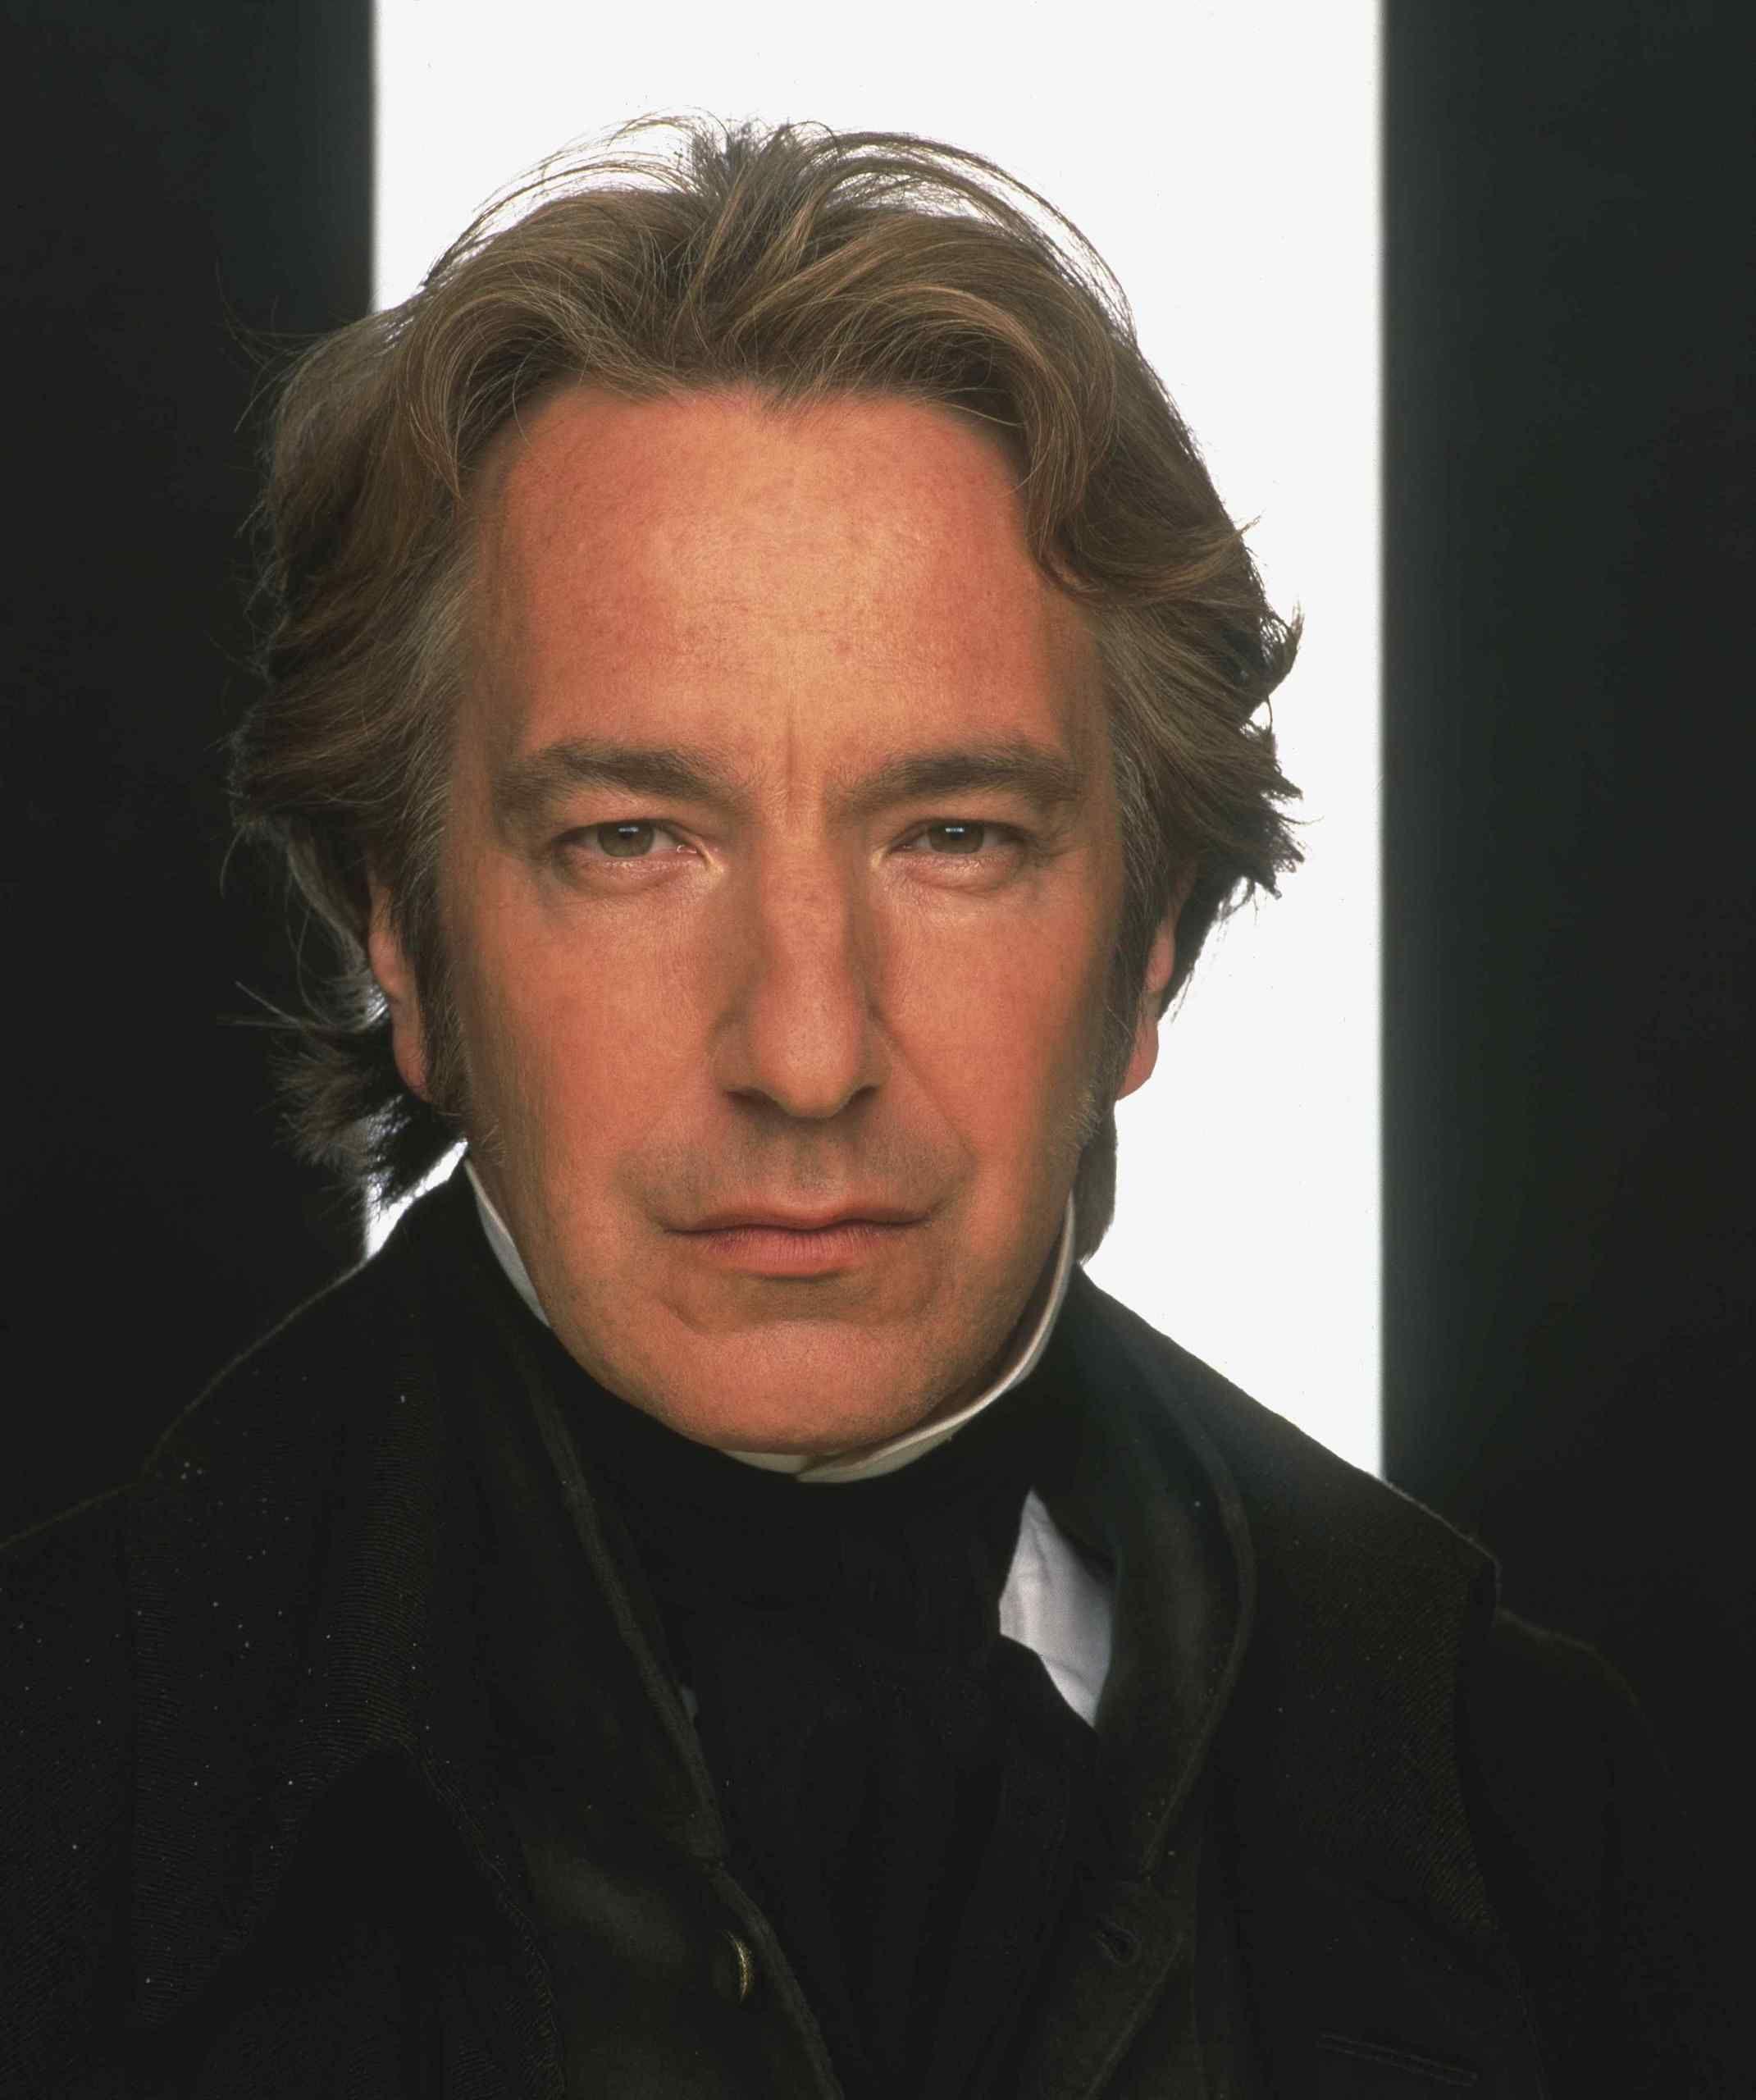 Colonel Brandon. (Alan Rickman).  From Jane Austen's Sense and Sensibility, c. 1995 film version.